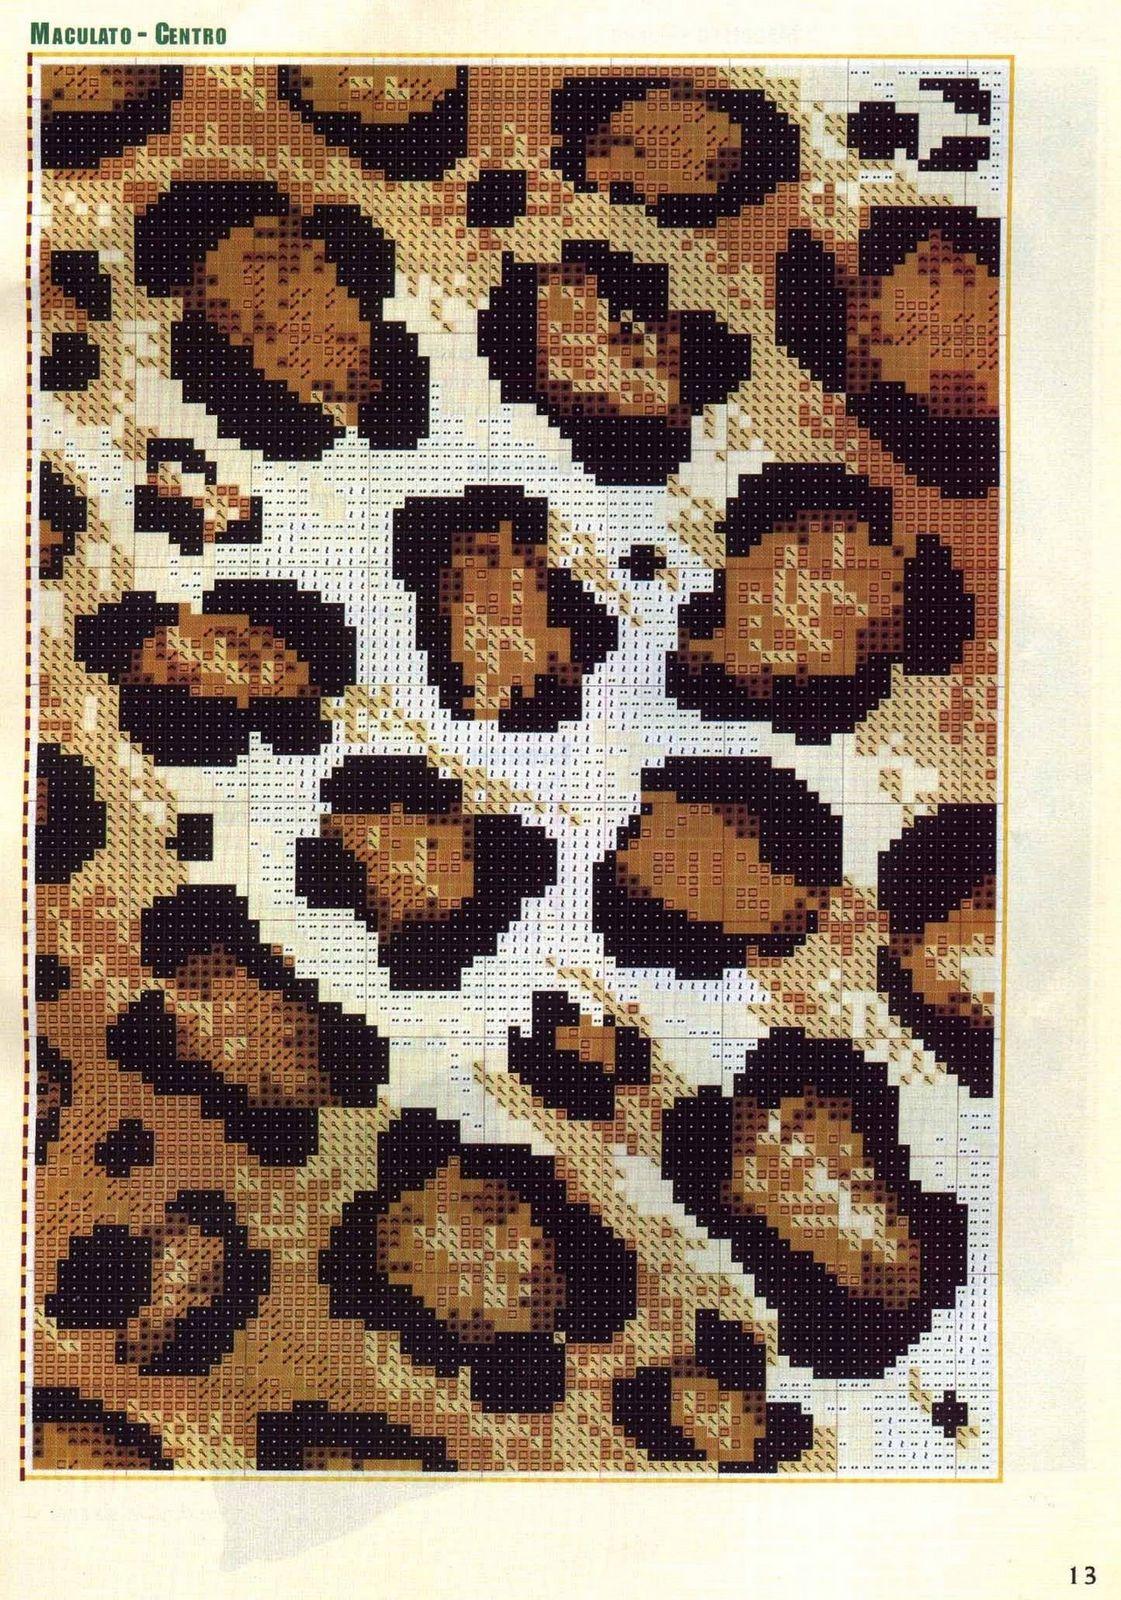 of look leopardato renata incorreggibili do wallpaper - Tumm-Tutum